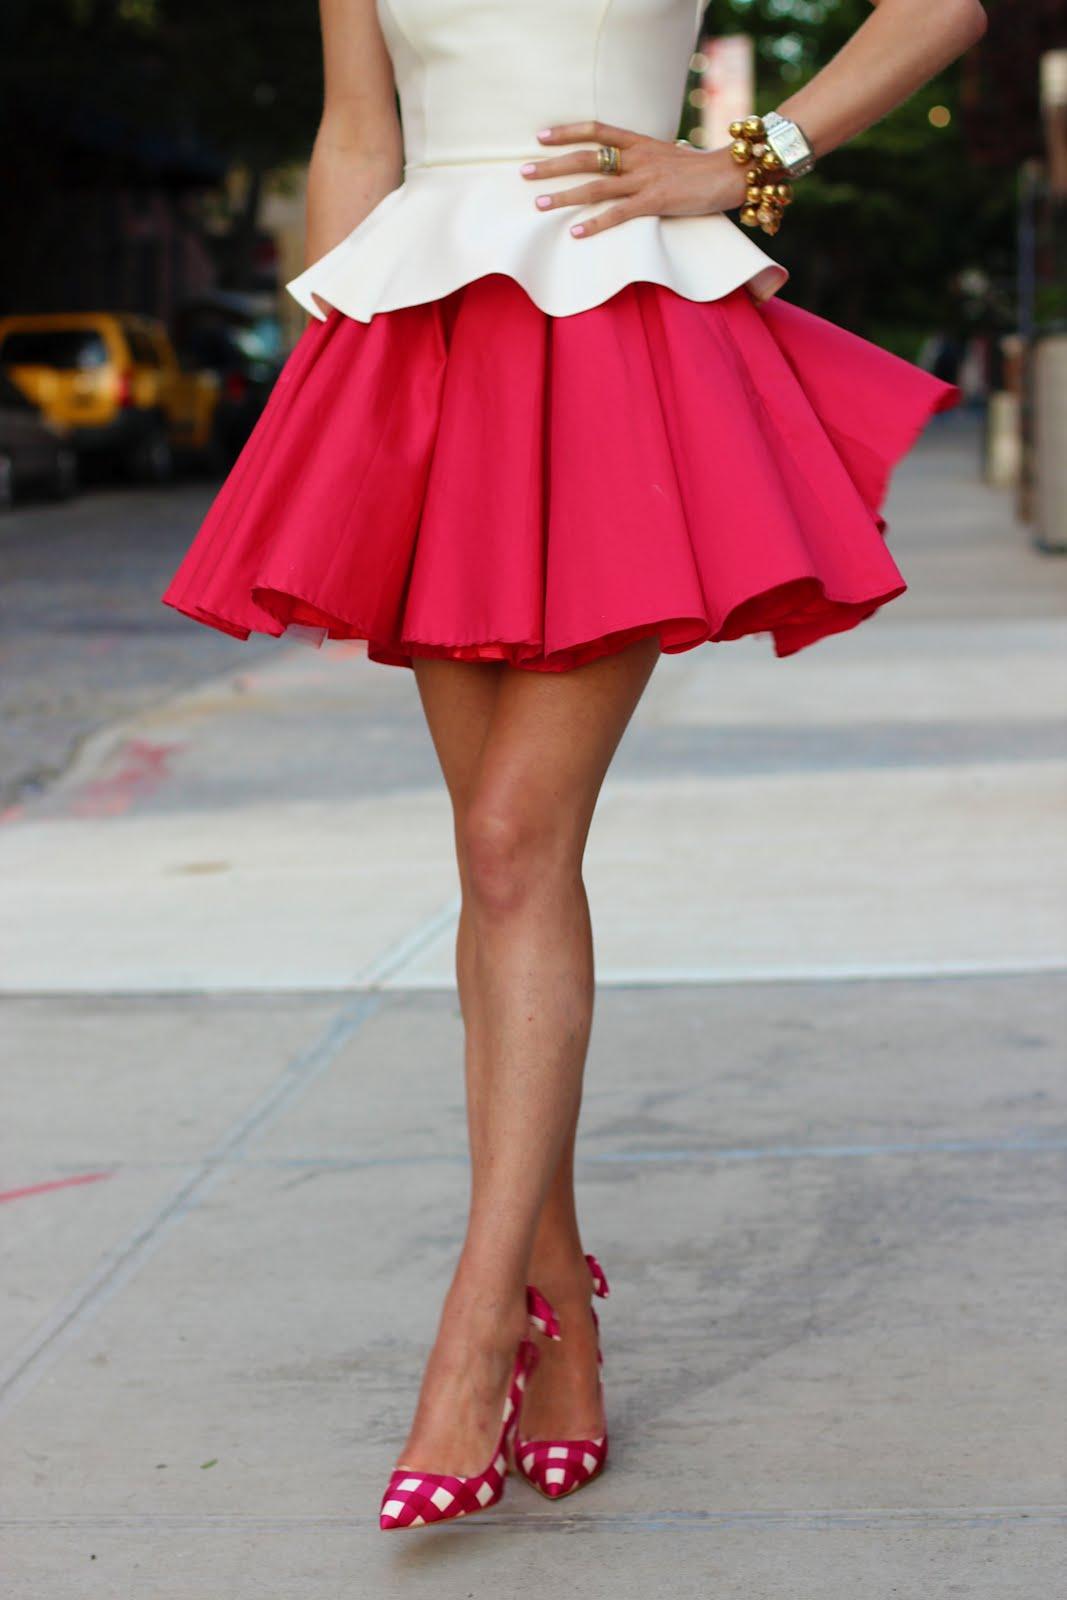 Розовая мини юбка на девушке фото 8 фотография